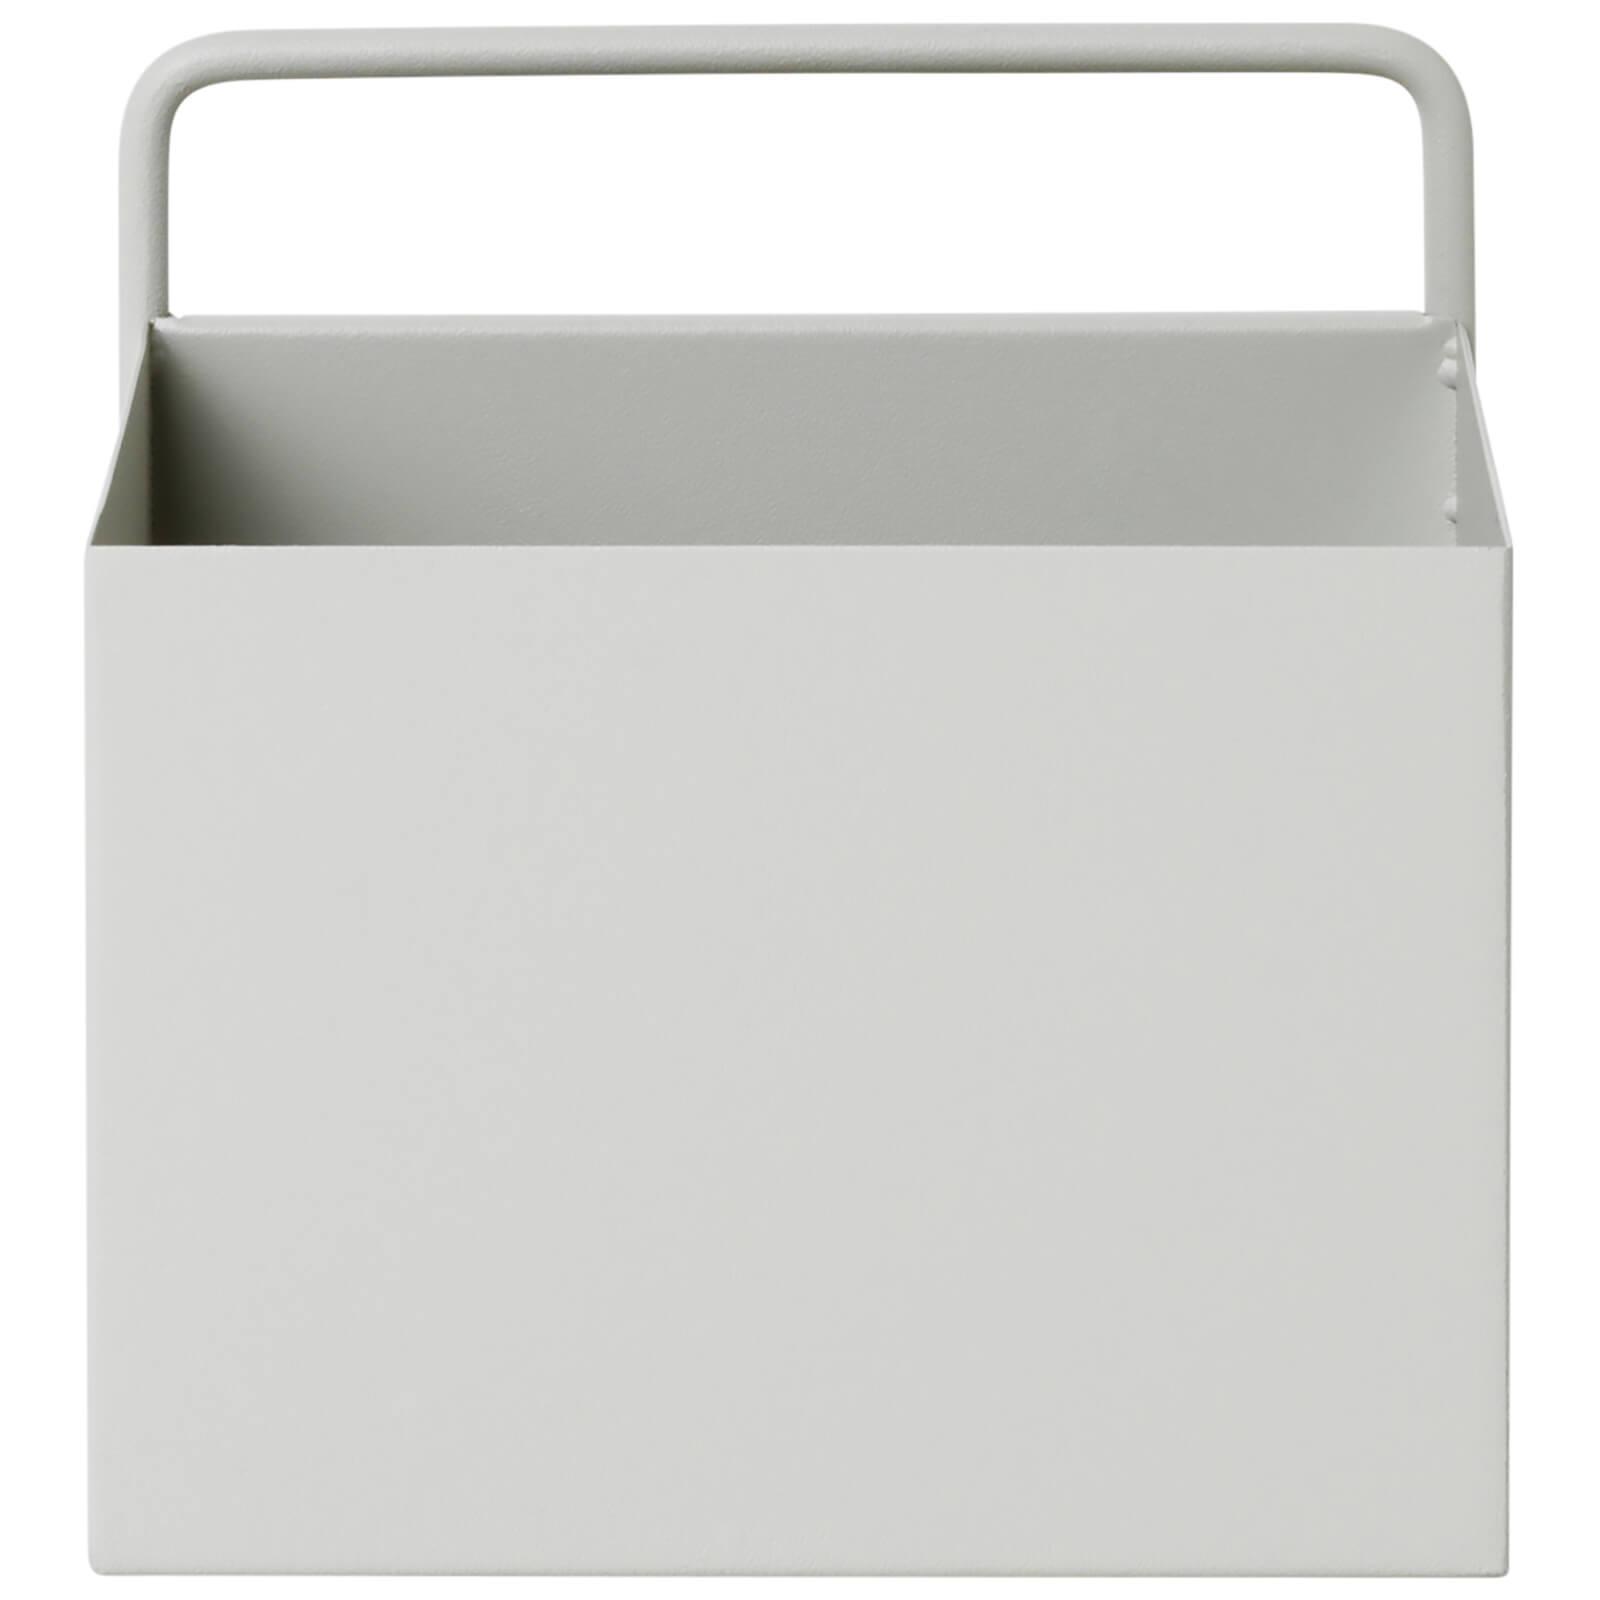 Ferm Living Wall Box - Square - Light Grey